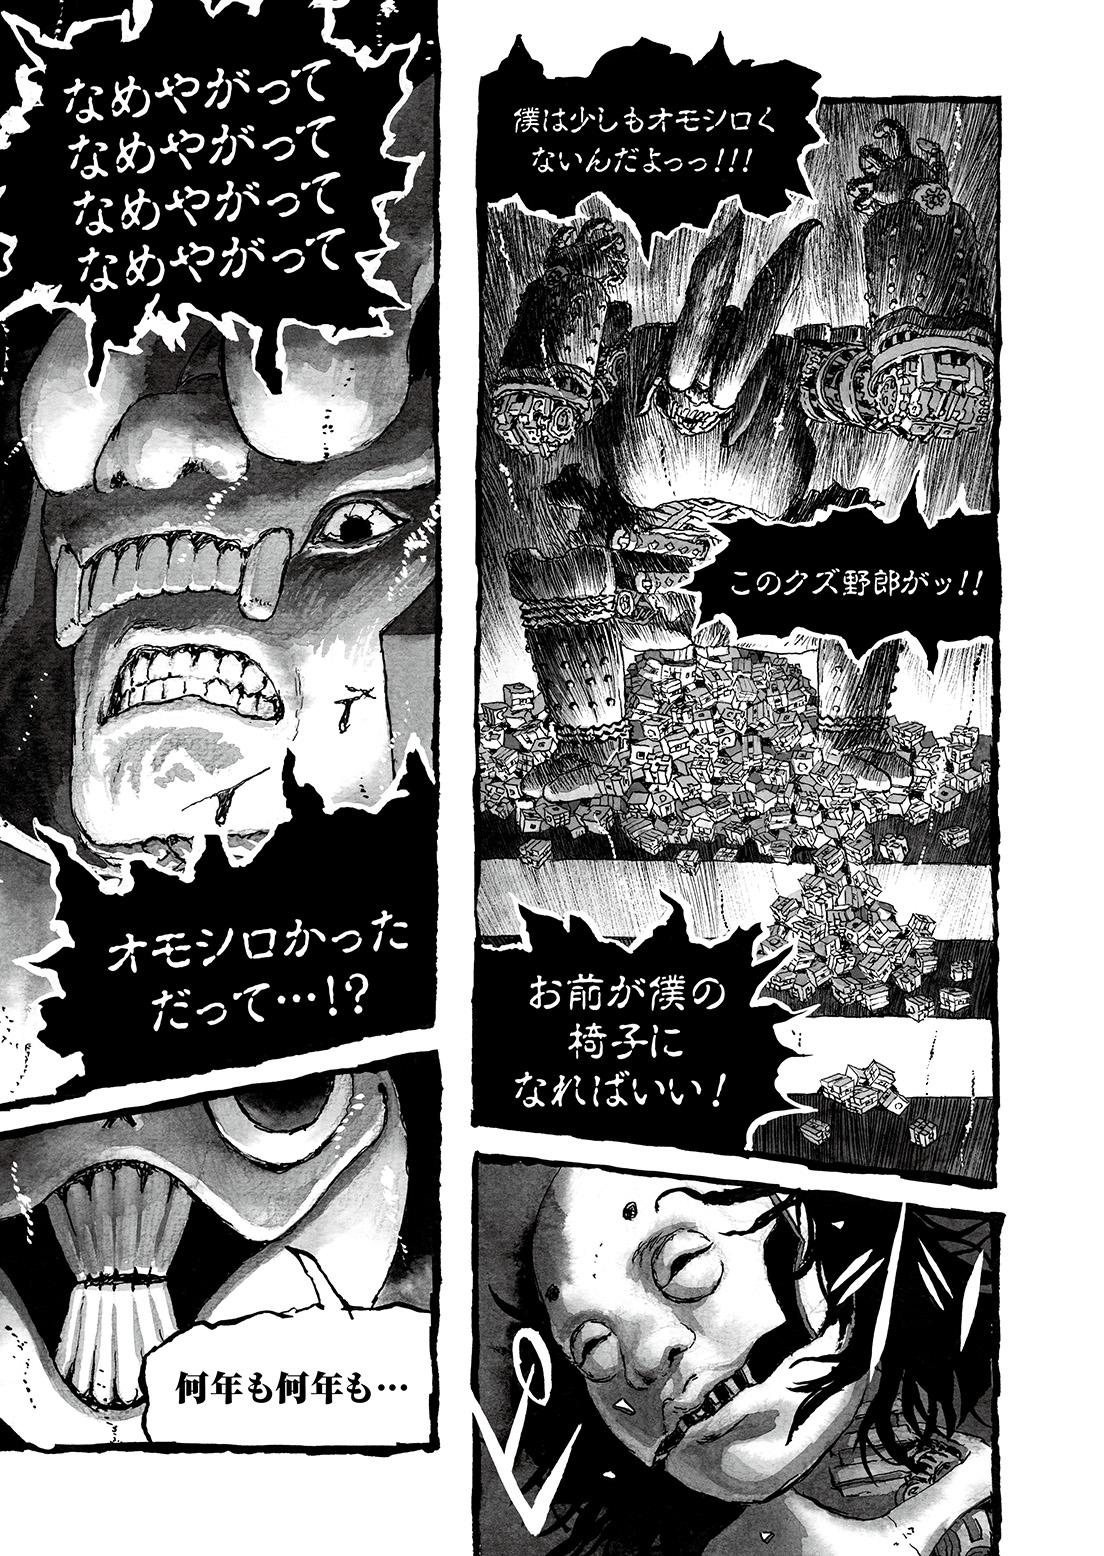 長編漫画「BIBLIOMANIA」連載 第2話「430号室の審判」13P